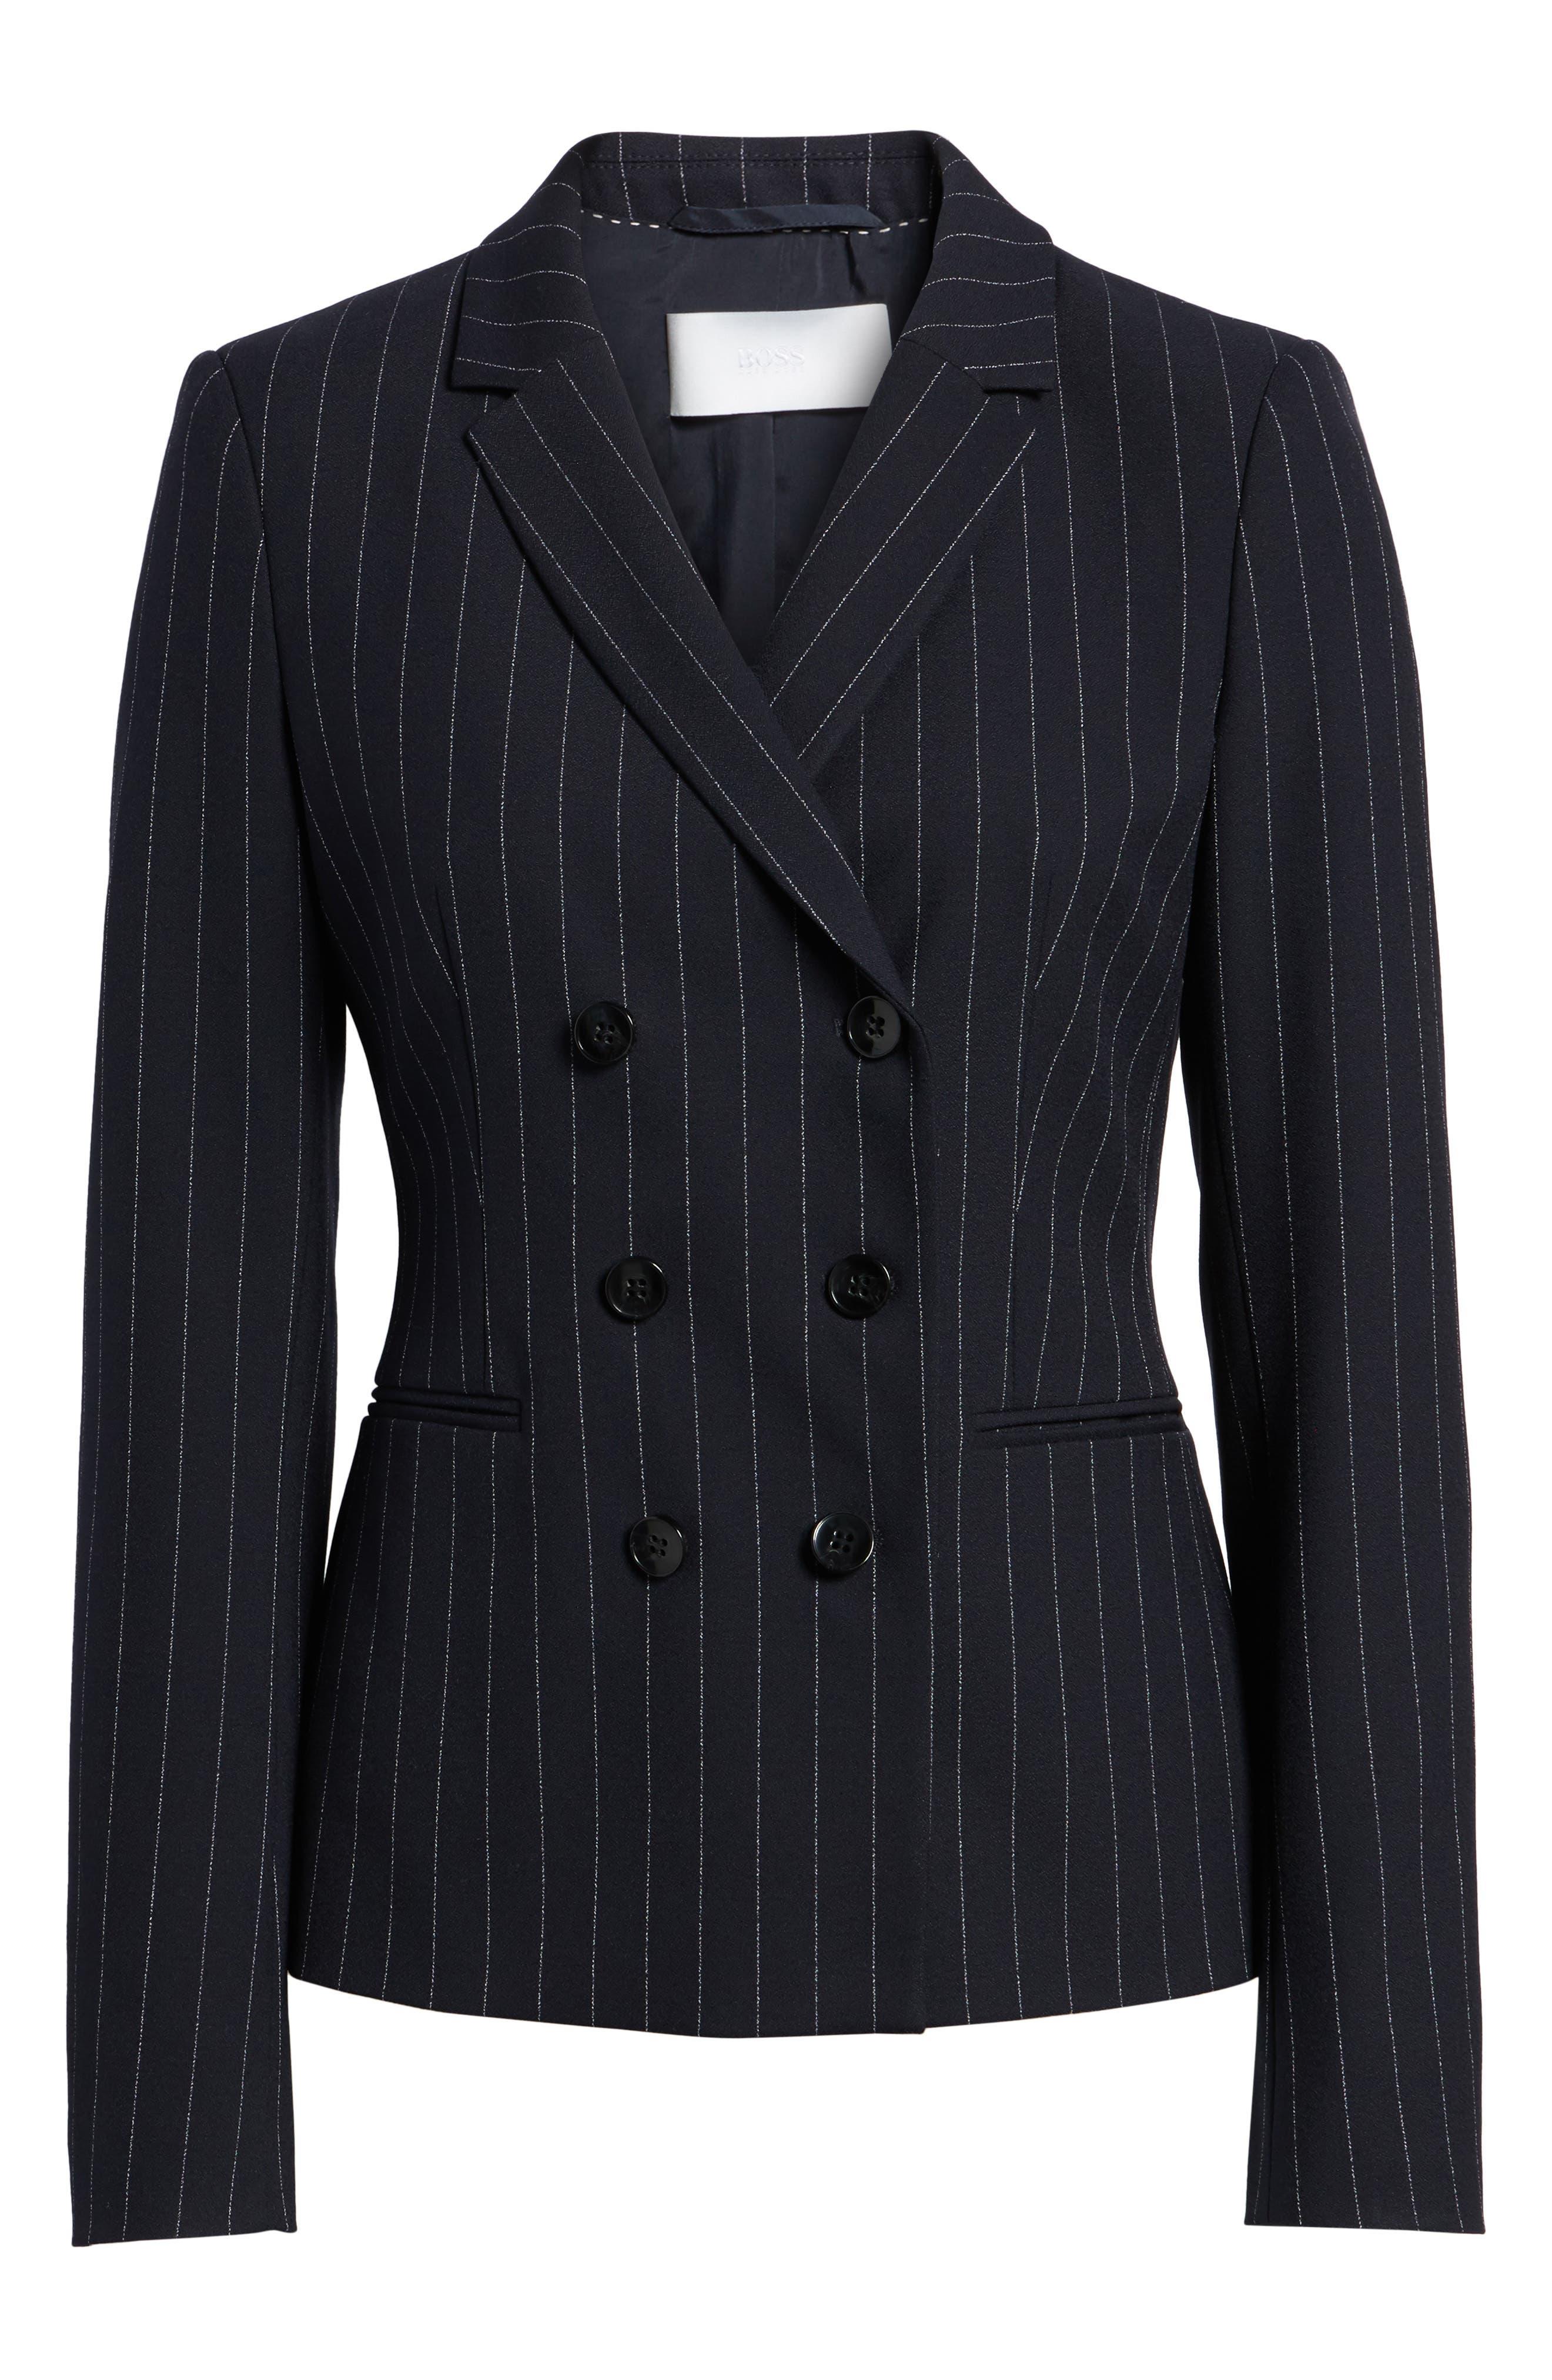 Jelaya Double Breasted Suit Jacket,                             Alternate thumbnail 7, color,                             Navy Fantasy